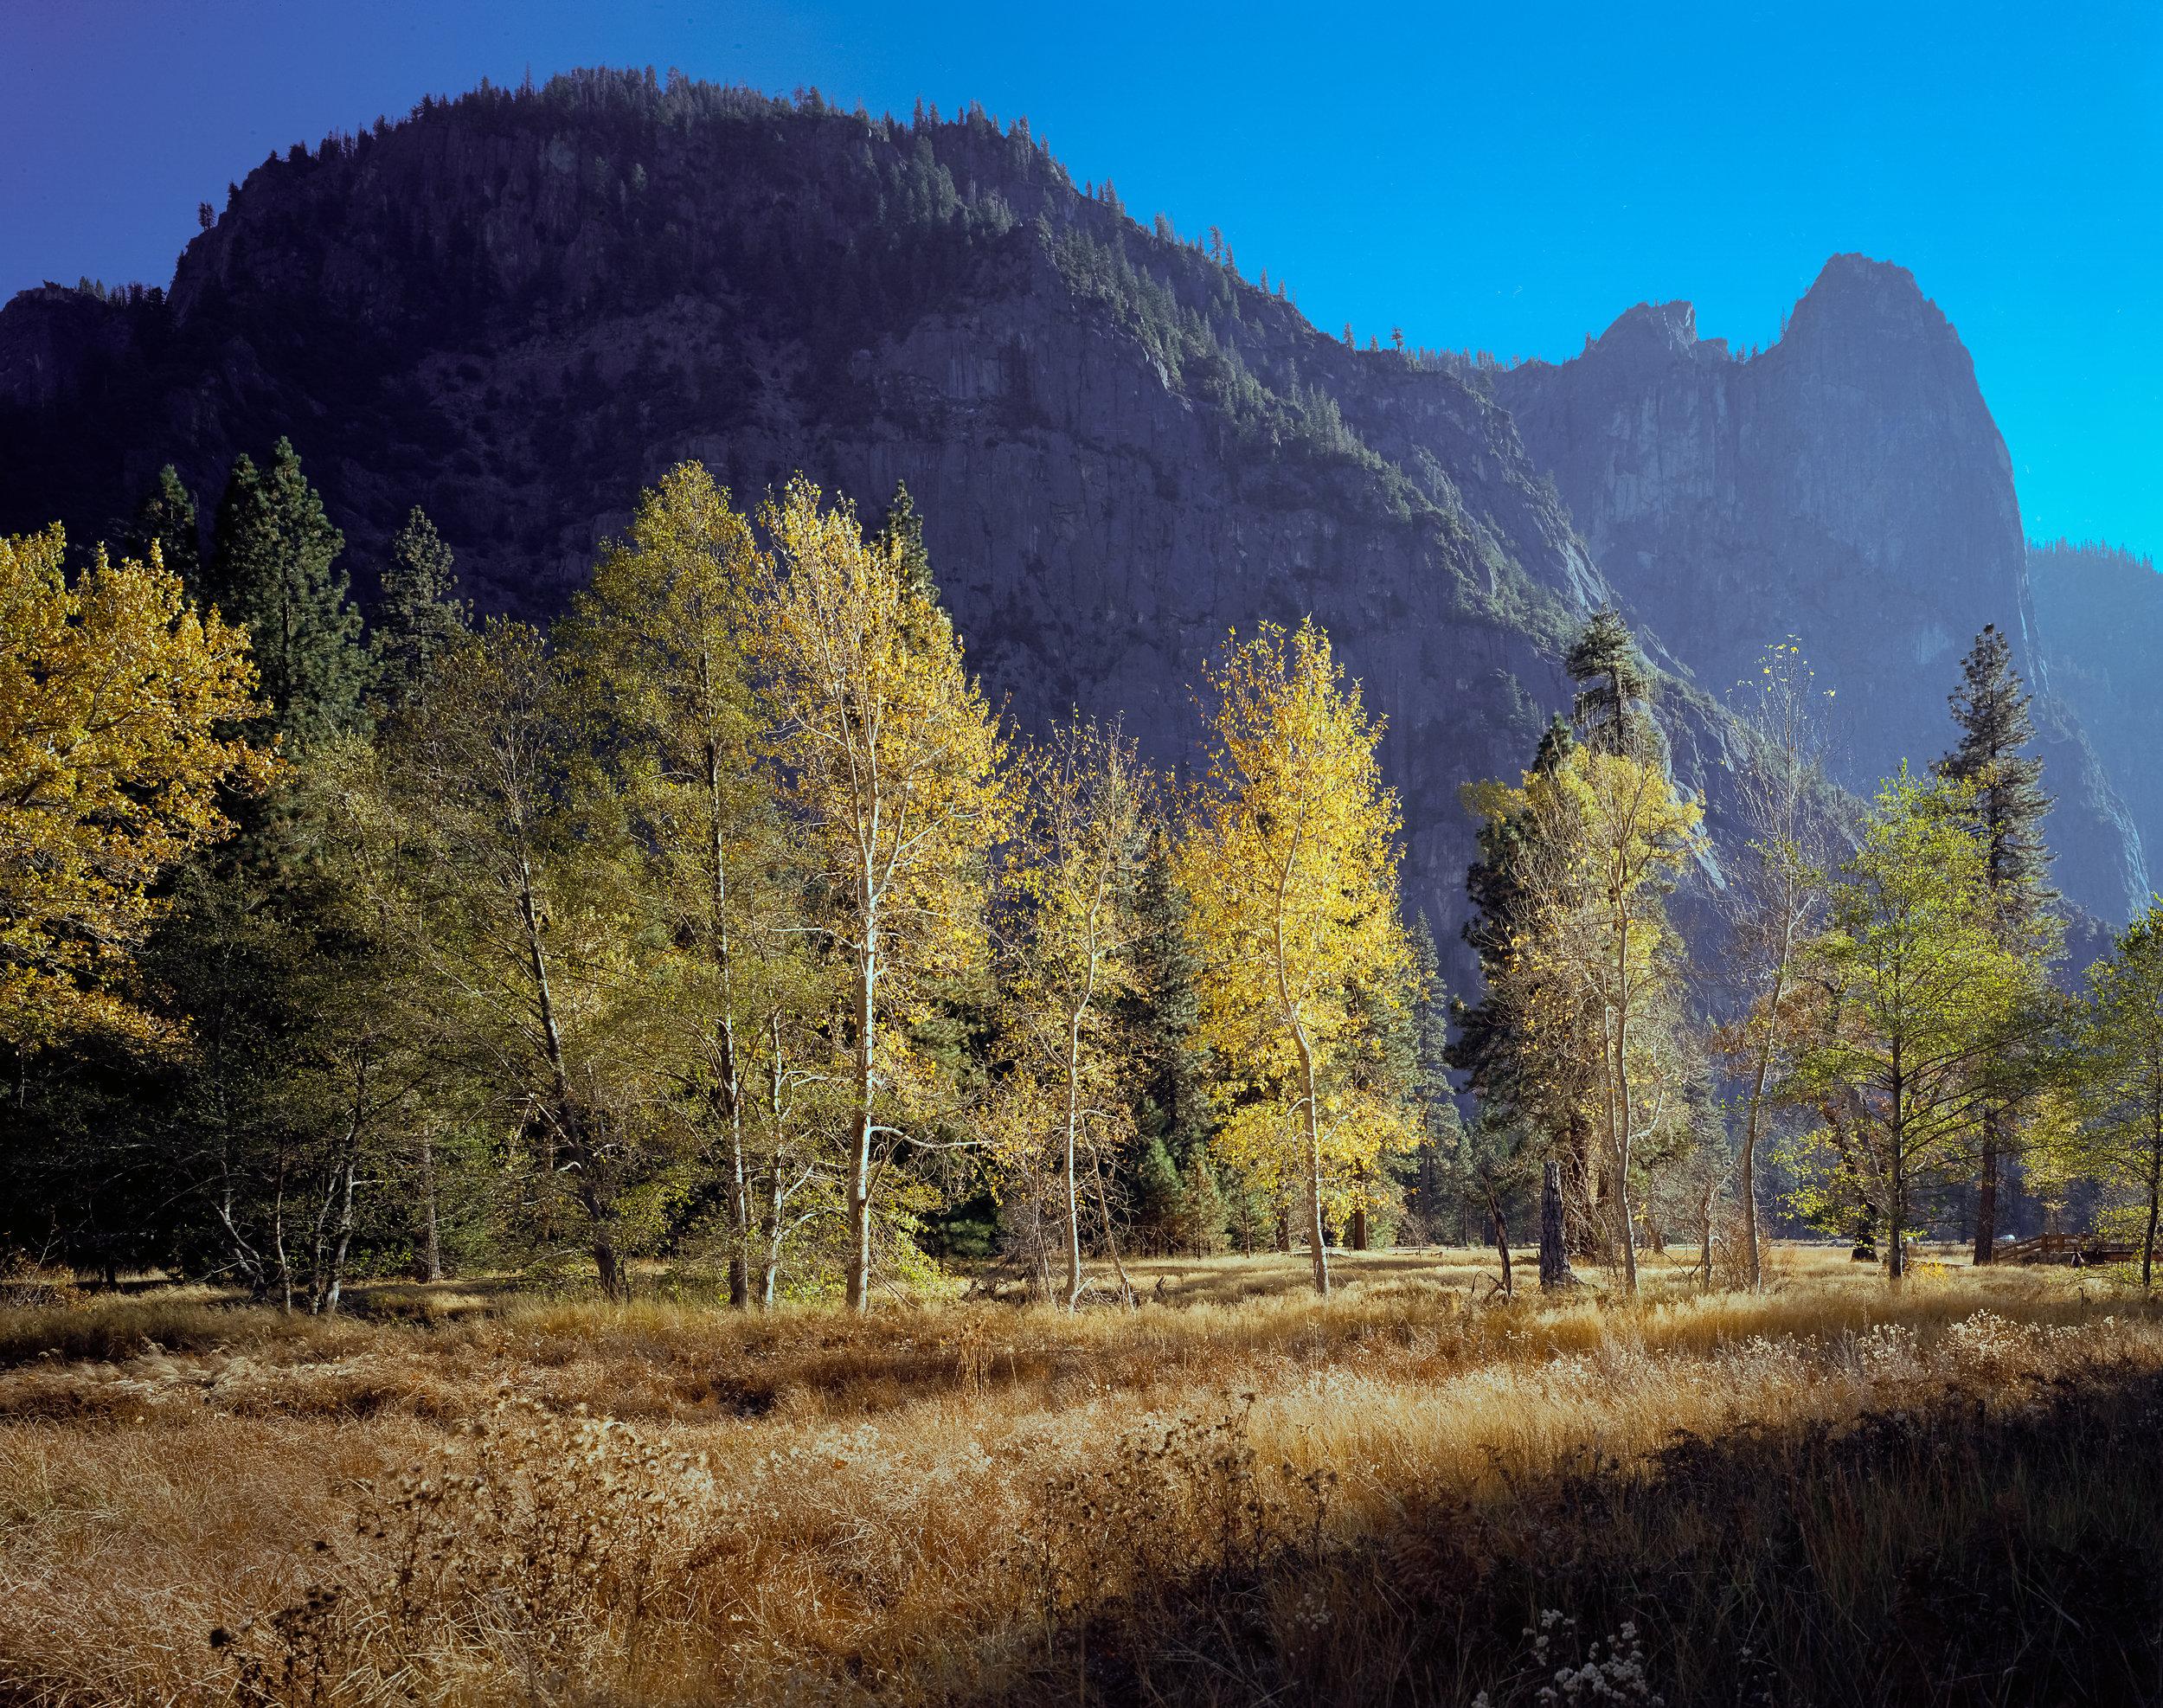 Yosemite cl-0011.jpg